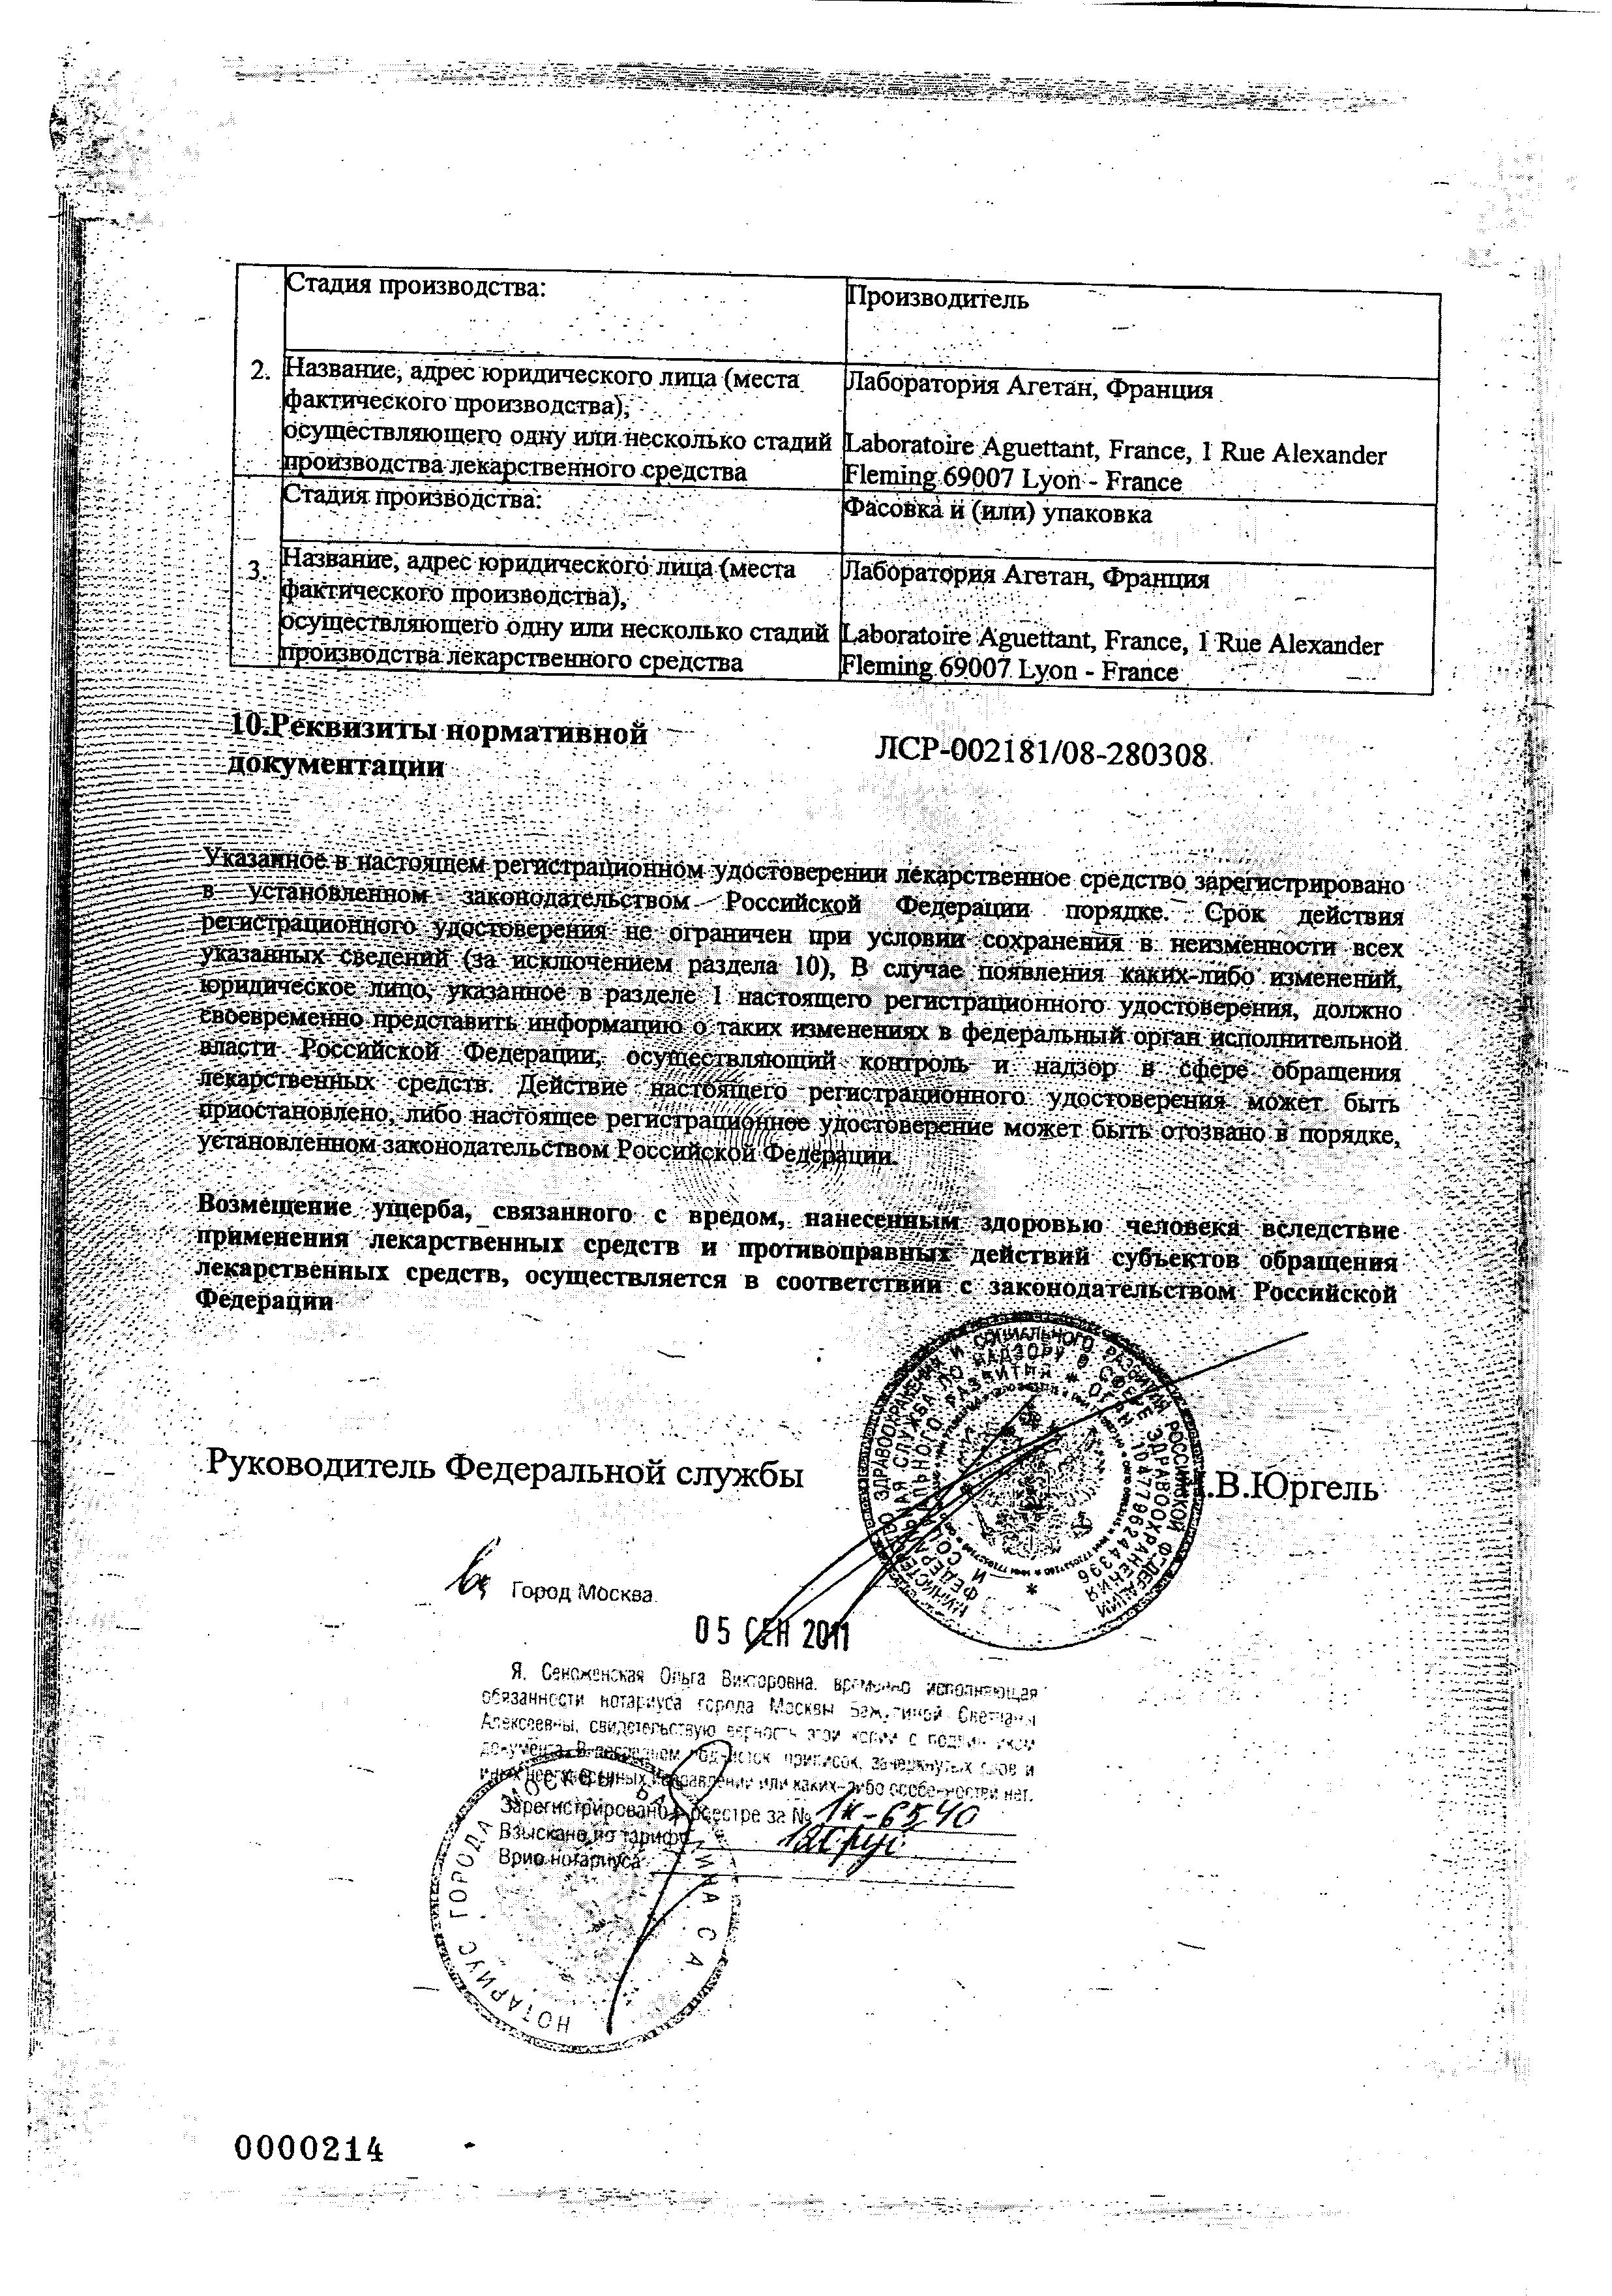 Норадреналин Агетан сертификат